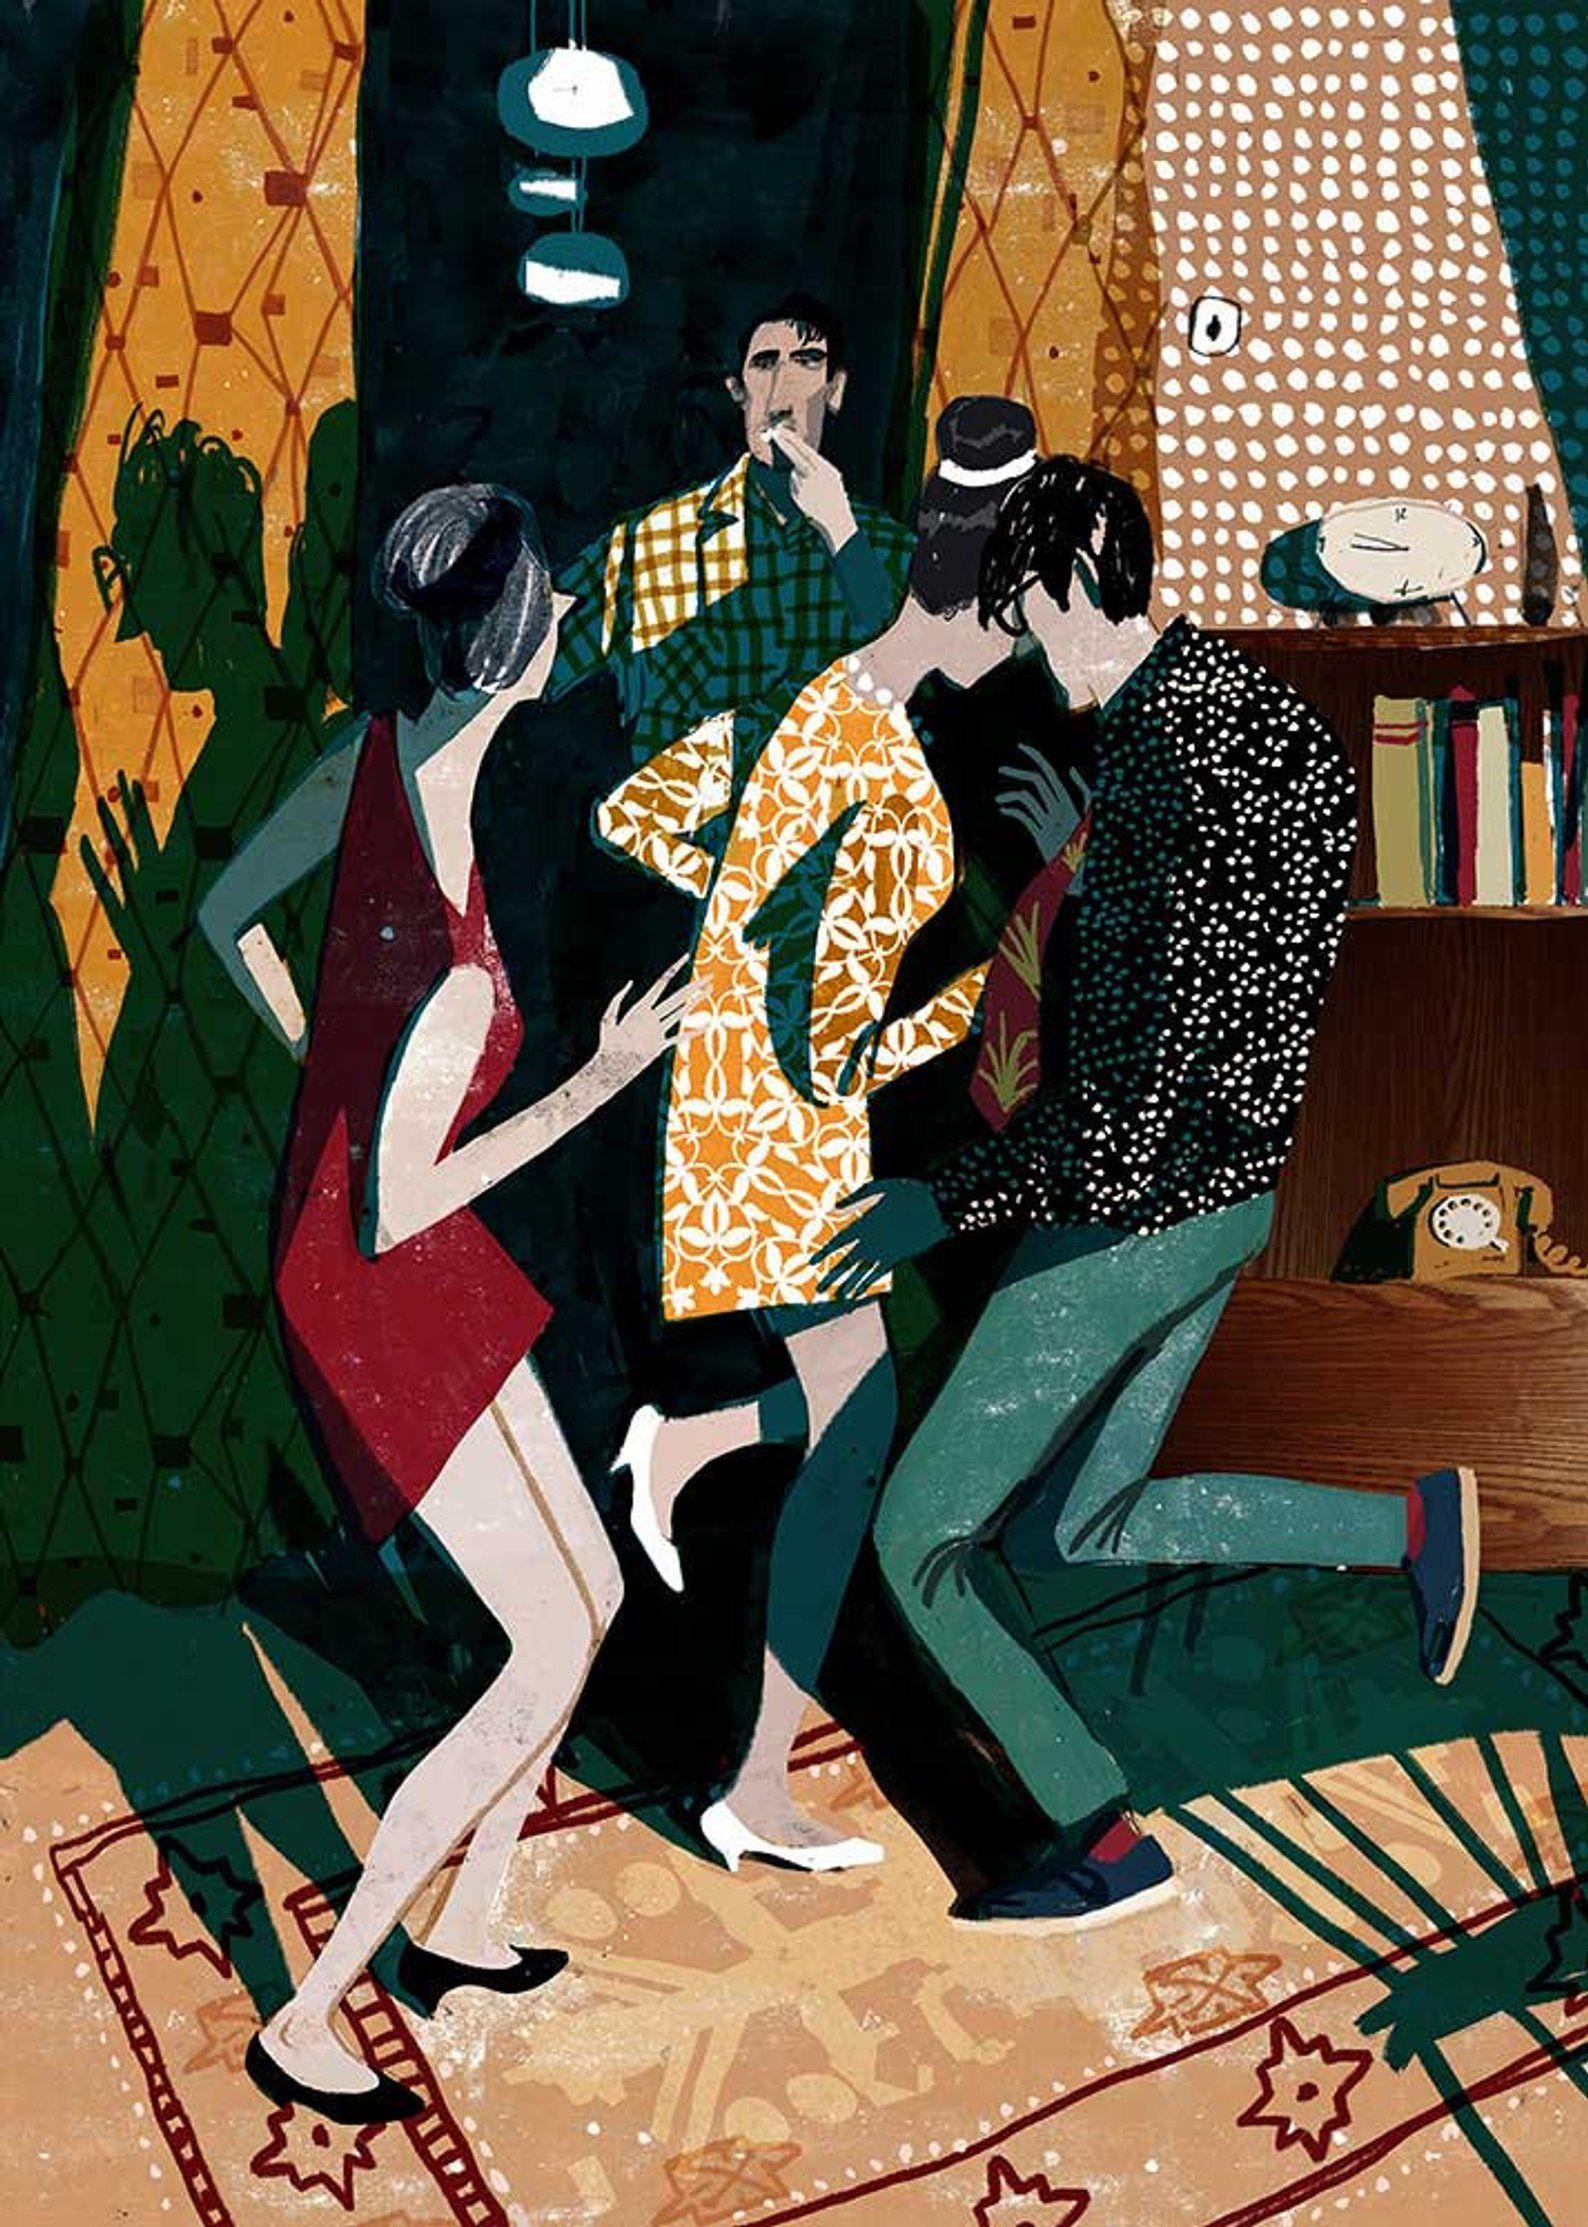 Spiksplinternieuw Twist Dance print, 60s, Jazz Club decor, Dance Poster, twist home DS-34